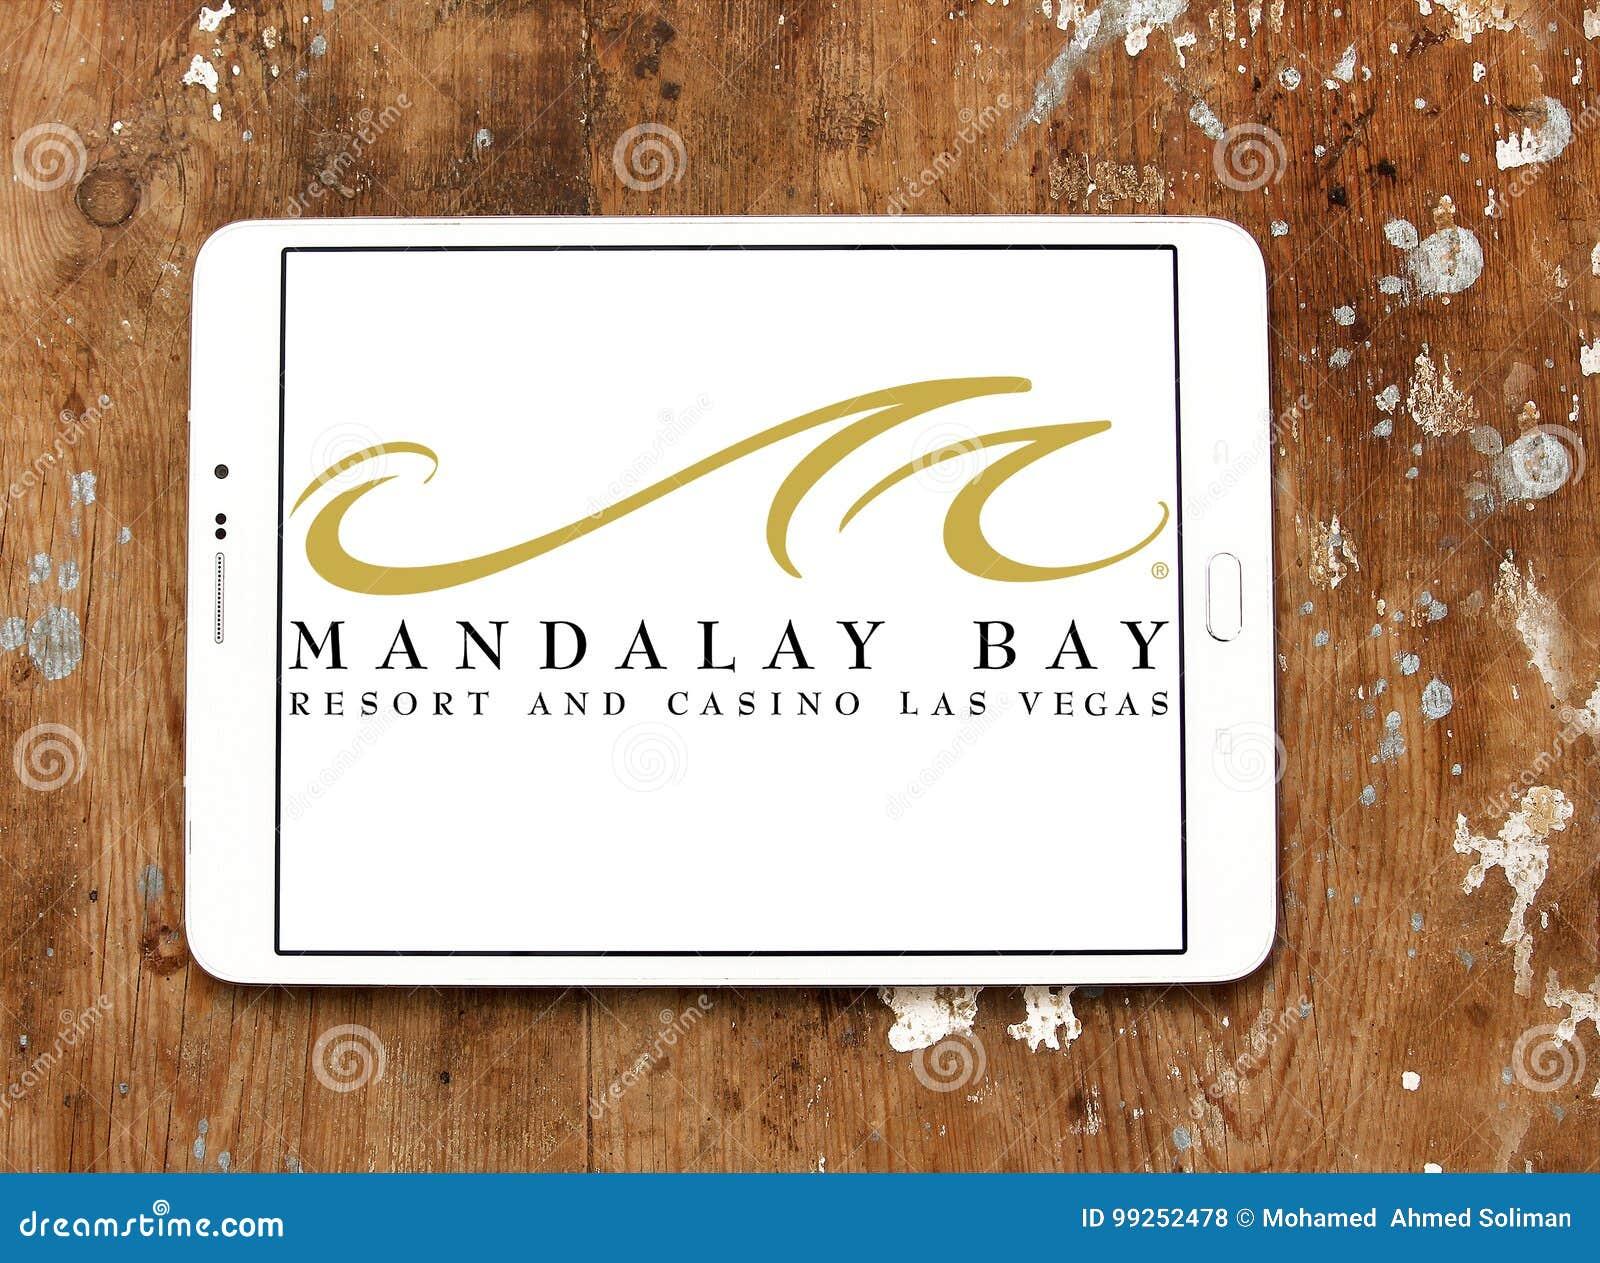 Mandalay Bay resort and casino las vegas logo